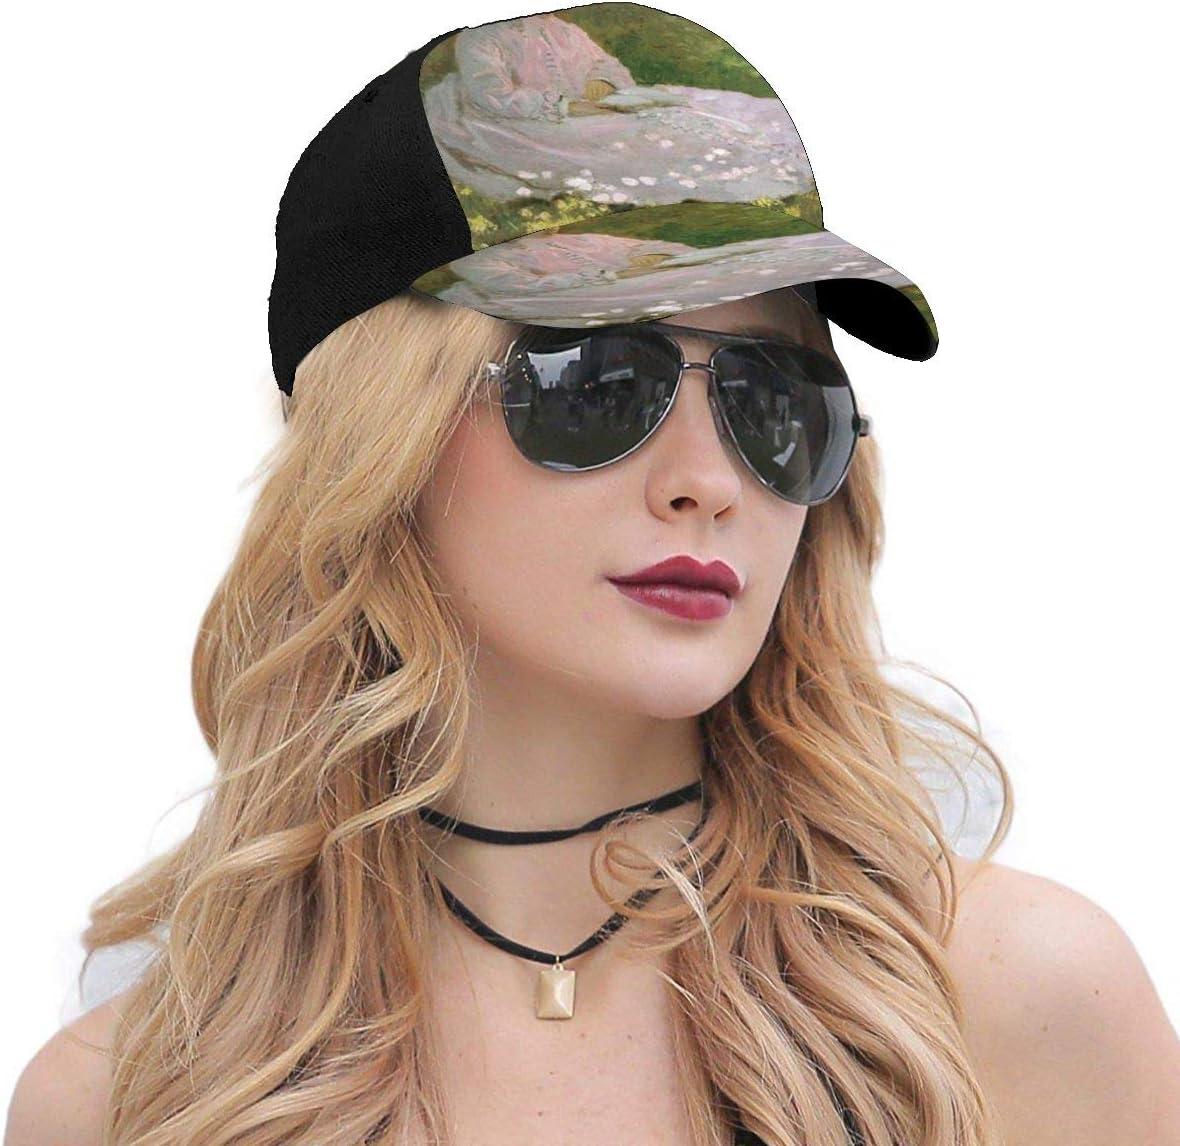 Springtime Monet Summer Baseball Caps for Men and Women with Adjustable Snapback Strap